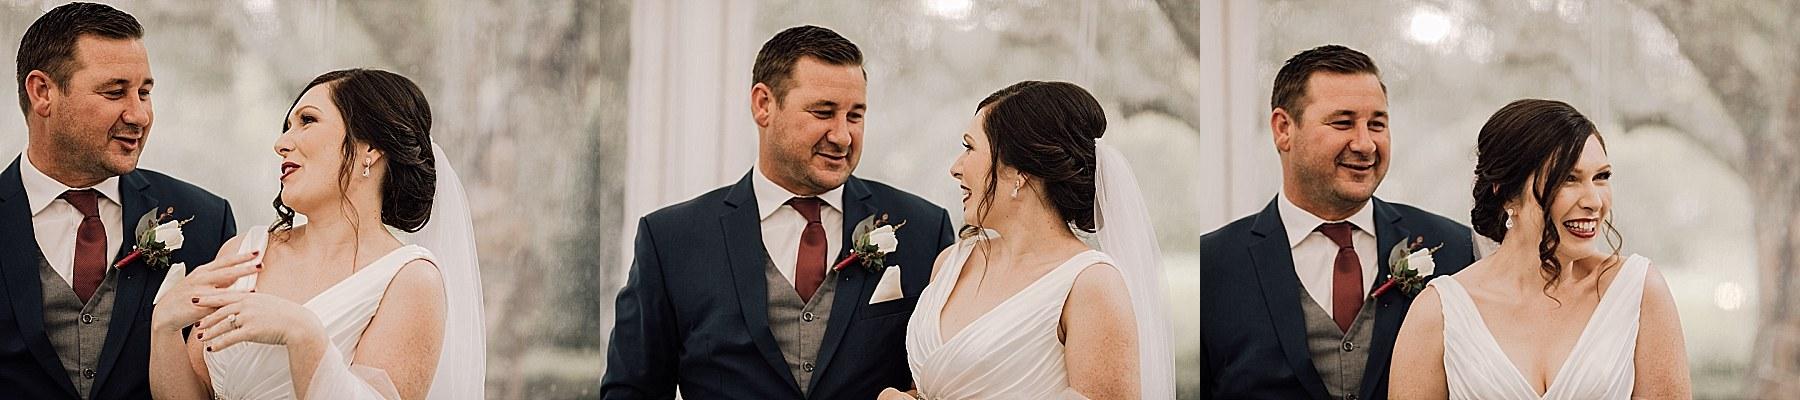 Allely Estate Wedding Auckland Wedding Photographer - Jana & Laurie_0135.jpg